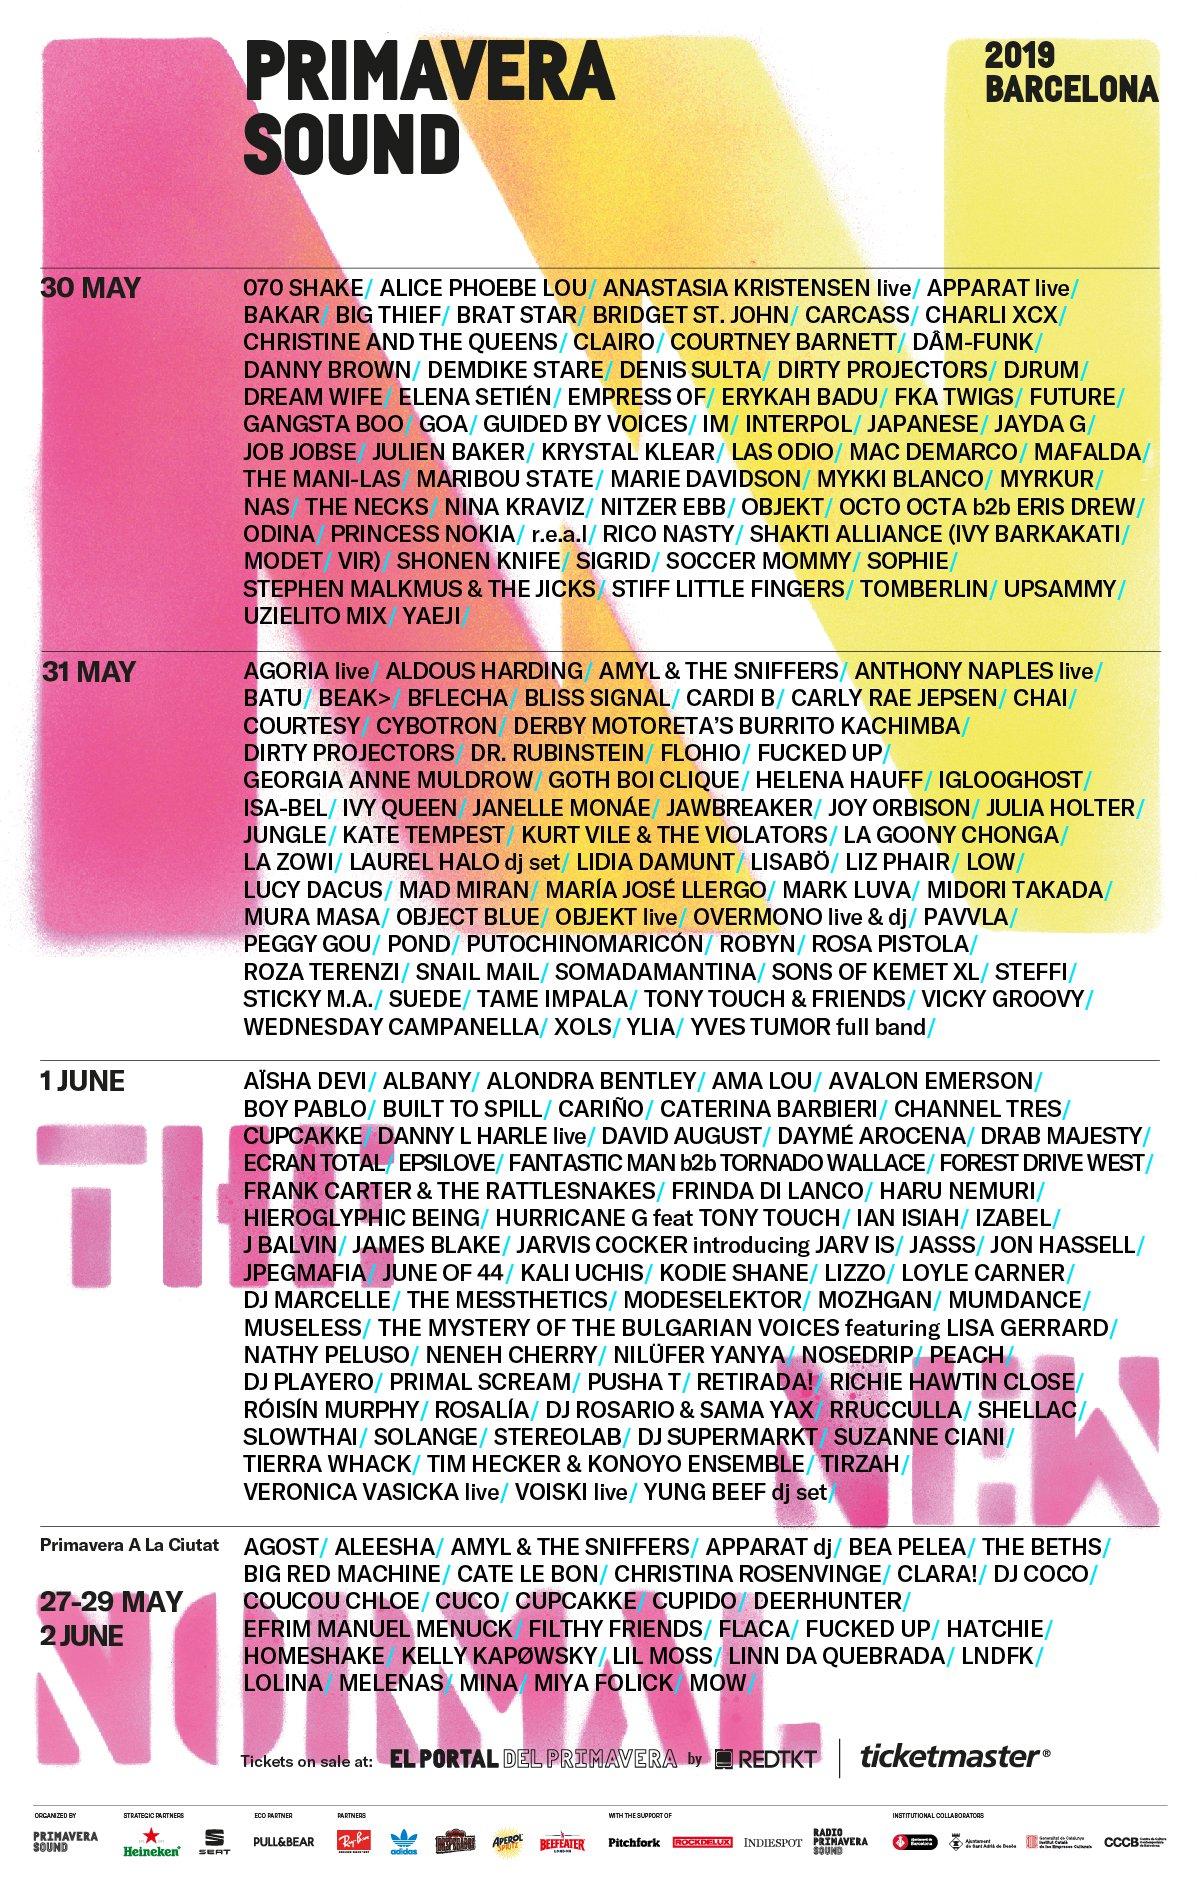 primavera sound 2019 lineup poster complete